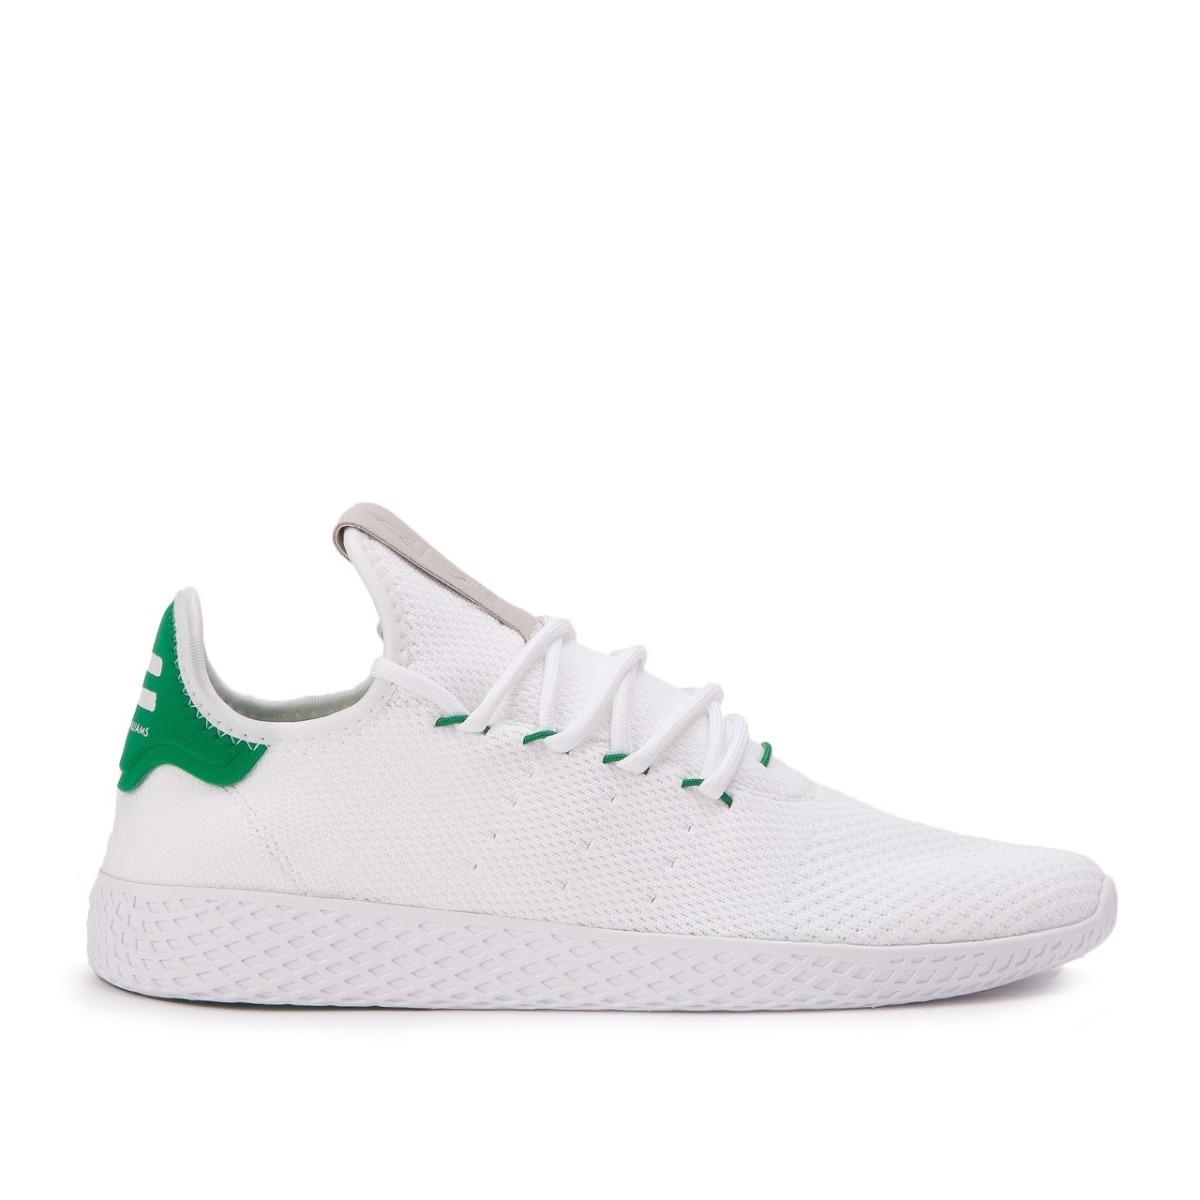 Hu Verde Pharrell Tenis Blanco Williams Primeknit X Adidas qLVpjSUMzG